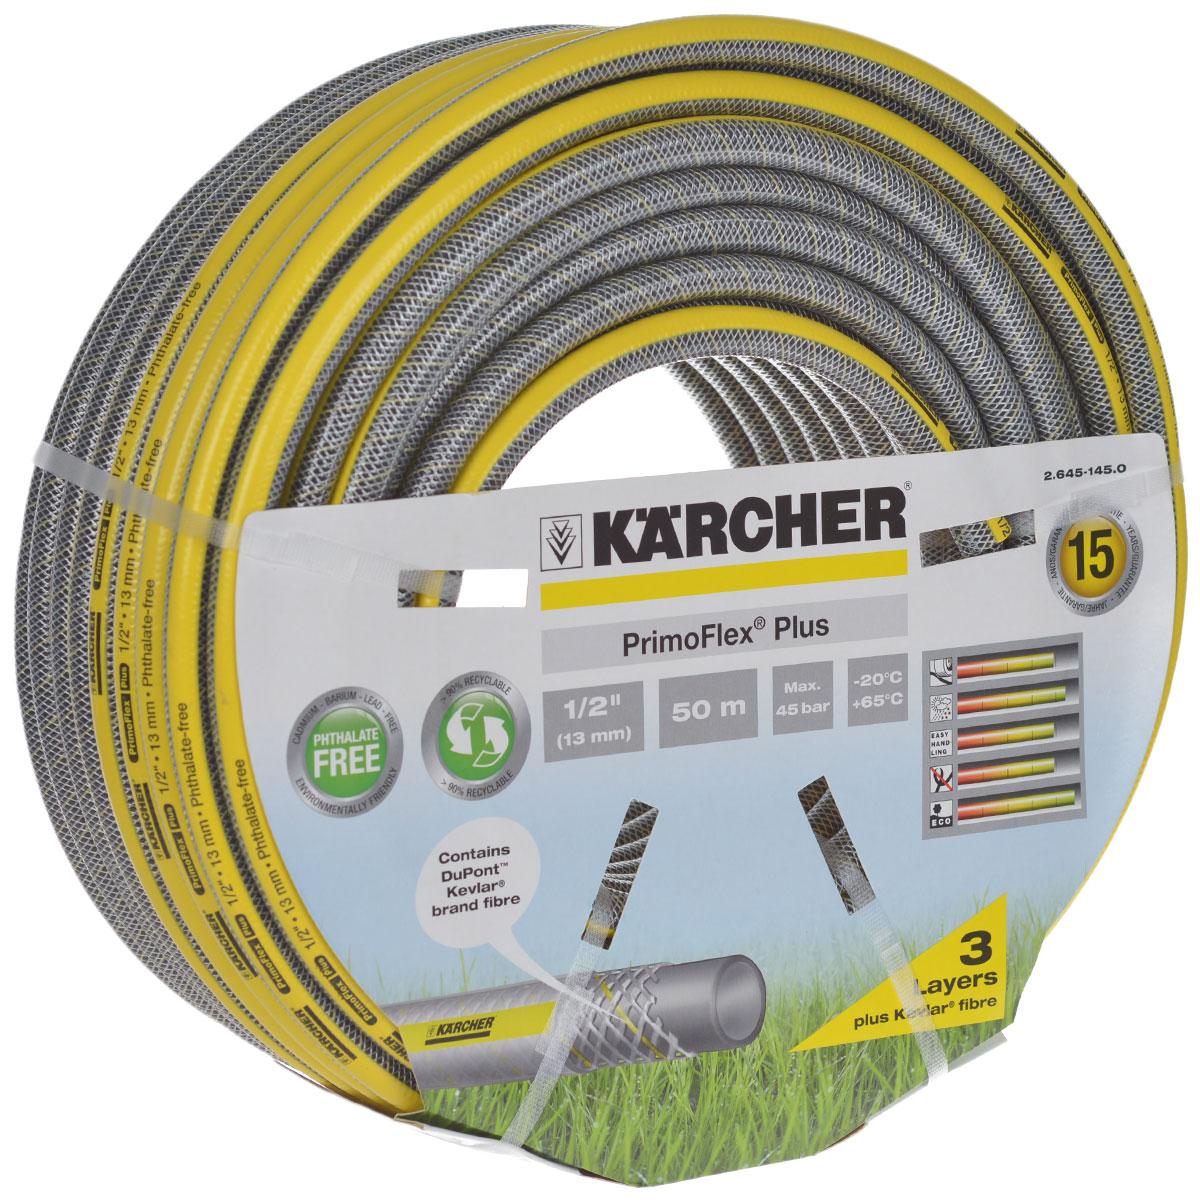 Шланг Karcher PrimoFlex plus, 1/2, 50 м 2.645-145.0